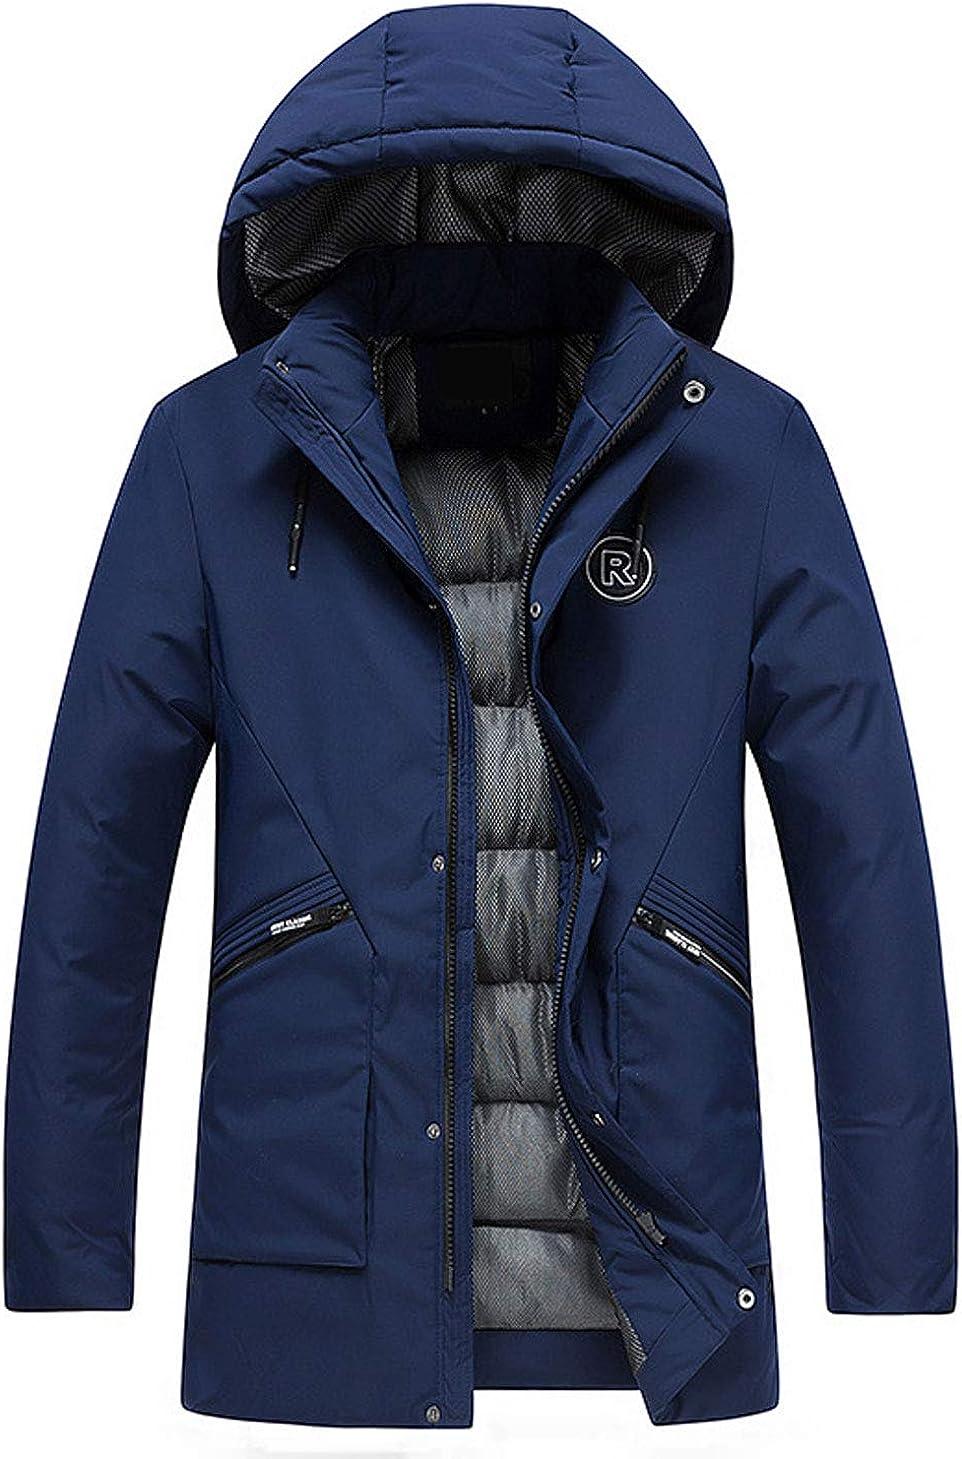 Itemnew Man's Basic Full Zipper Waterproof Mesh Lined Hooded Long Windbreaker Coat